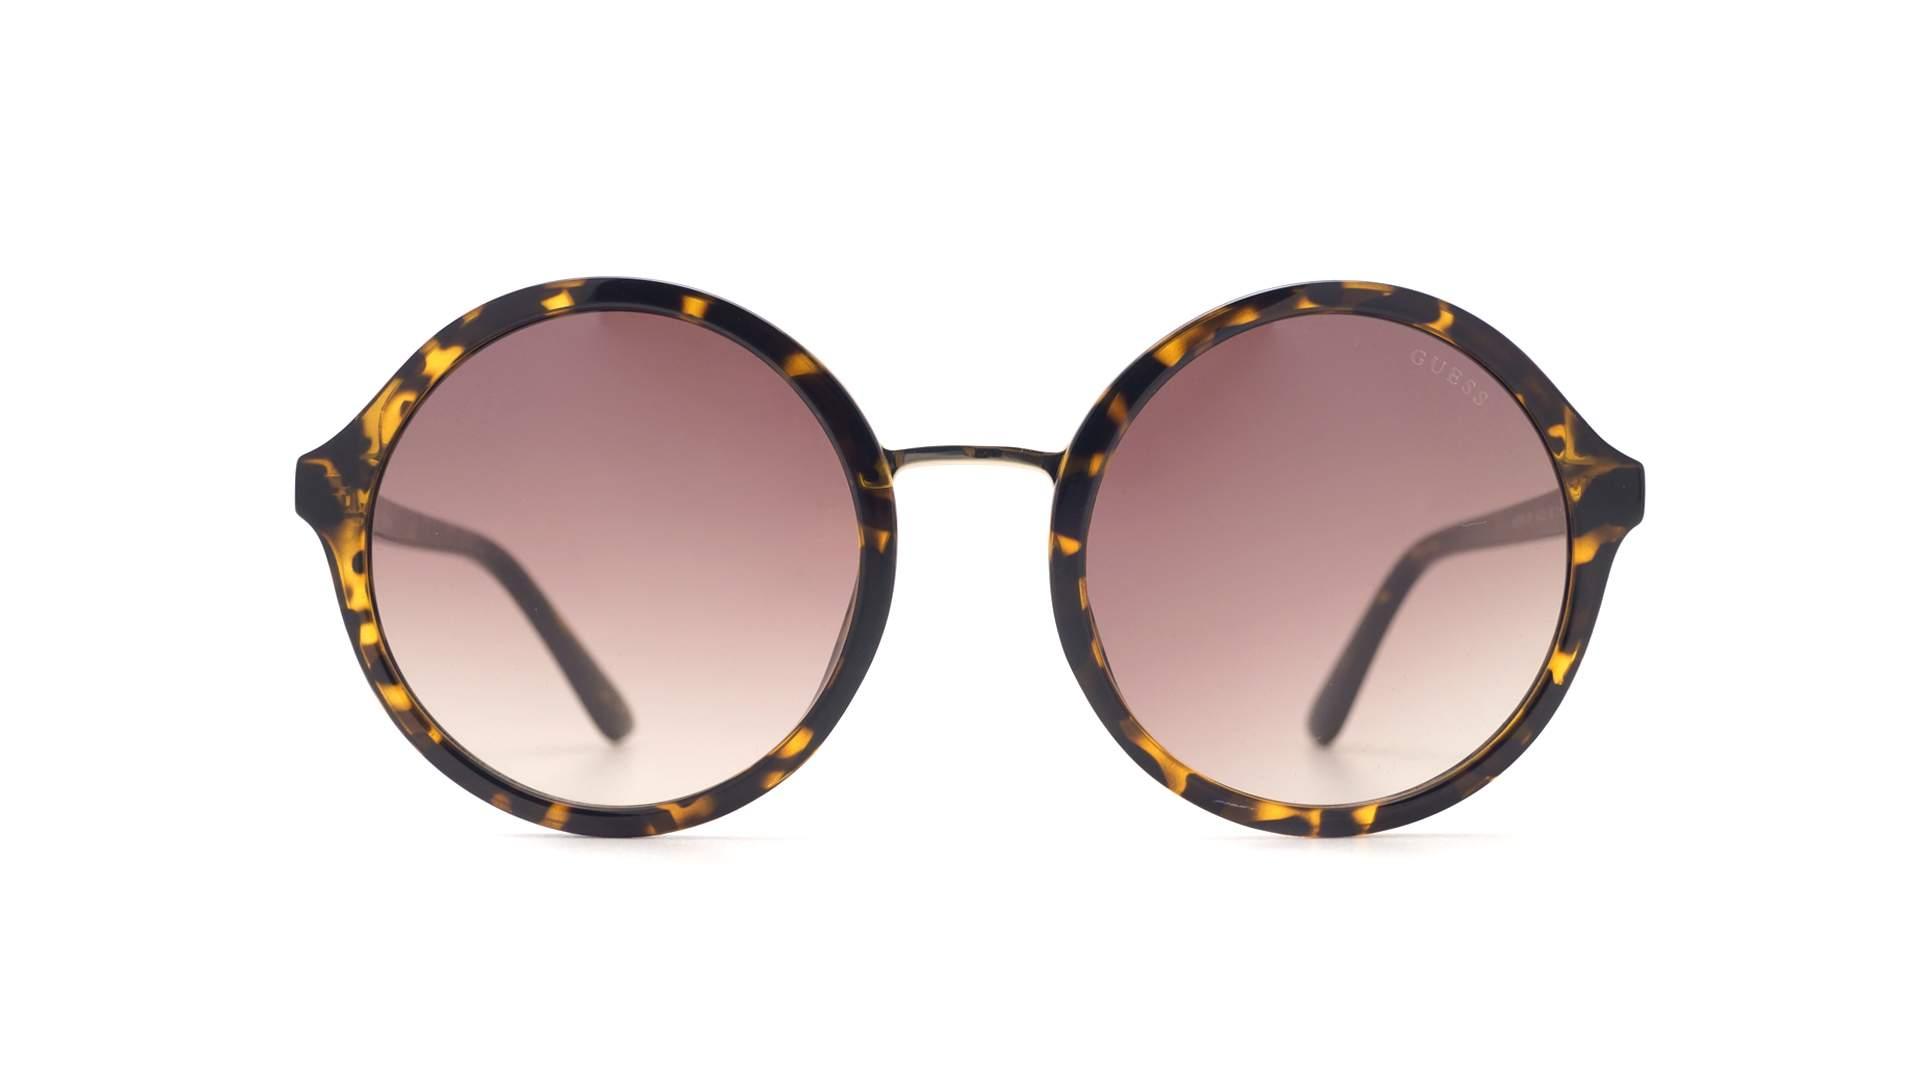 e3f644b80eb7 Sunglasses Guess GU7558 52F 54-22 Tortoise Large Gradient